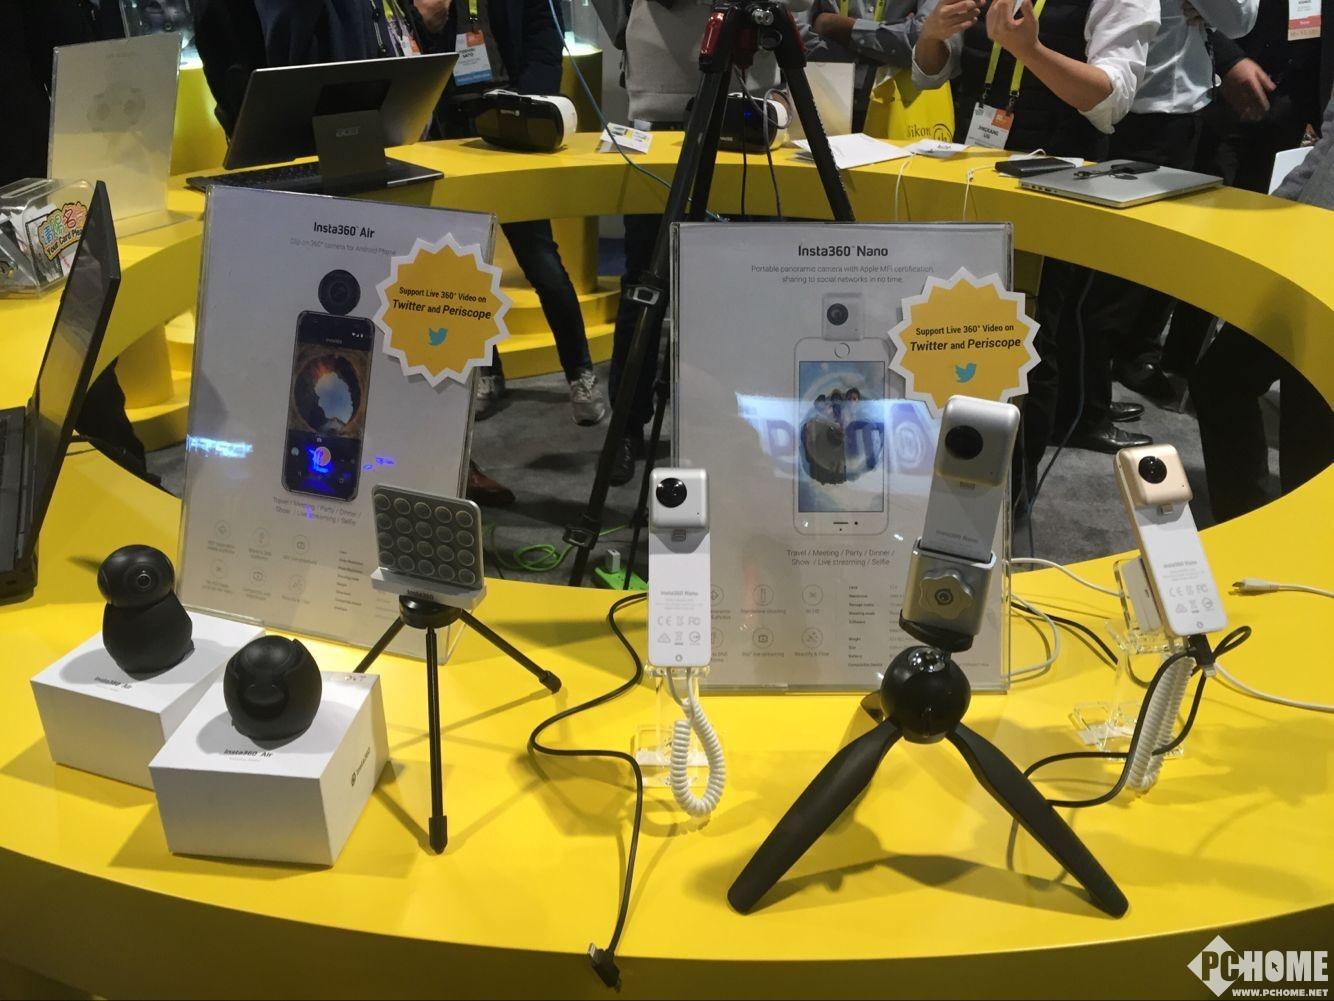 Insta360 CES展台 专业VR逼格满满